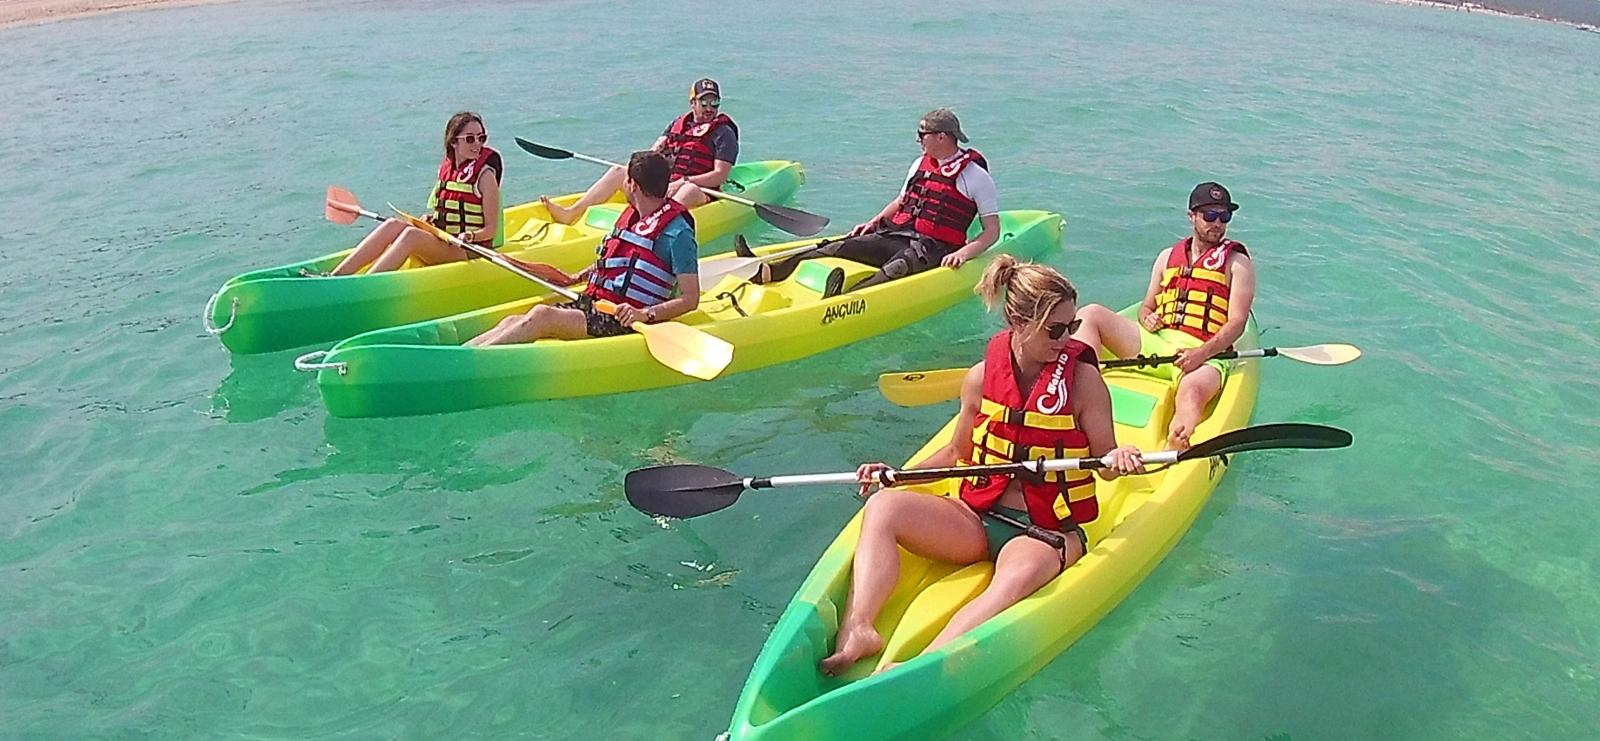 Location de canoë kayak - Plage de la Gaillarde